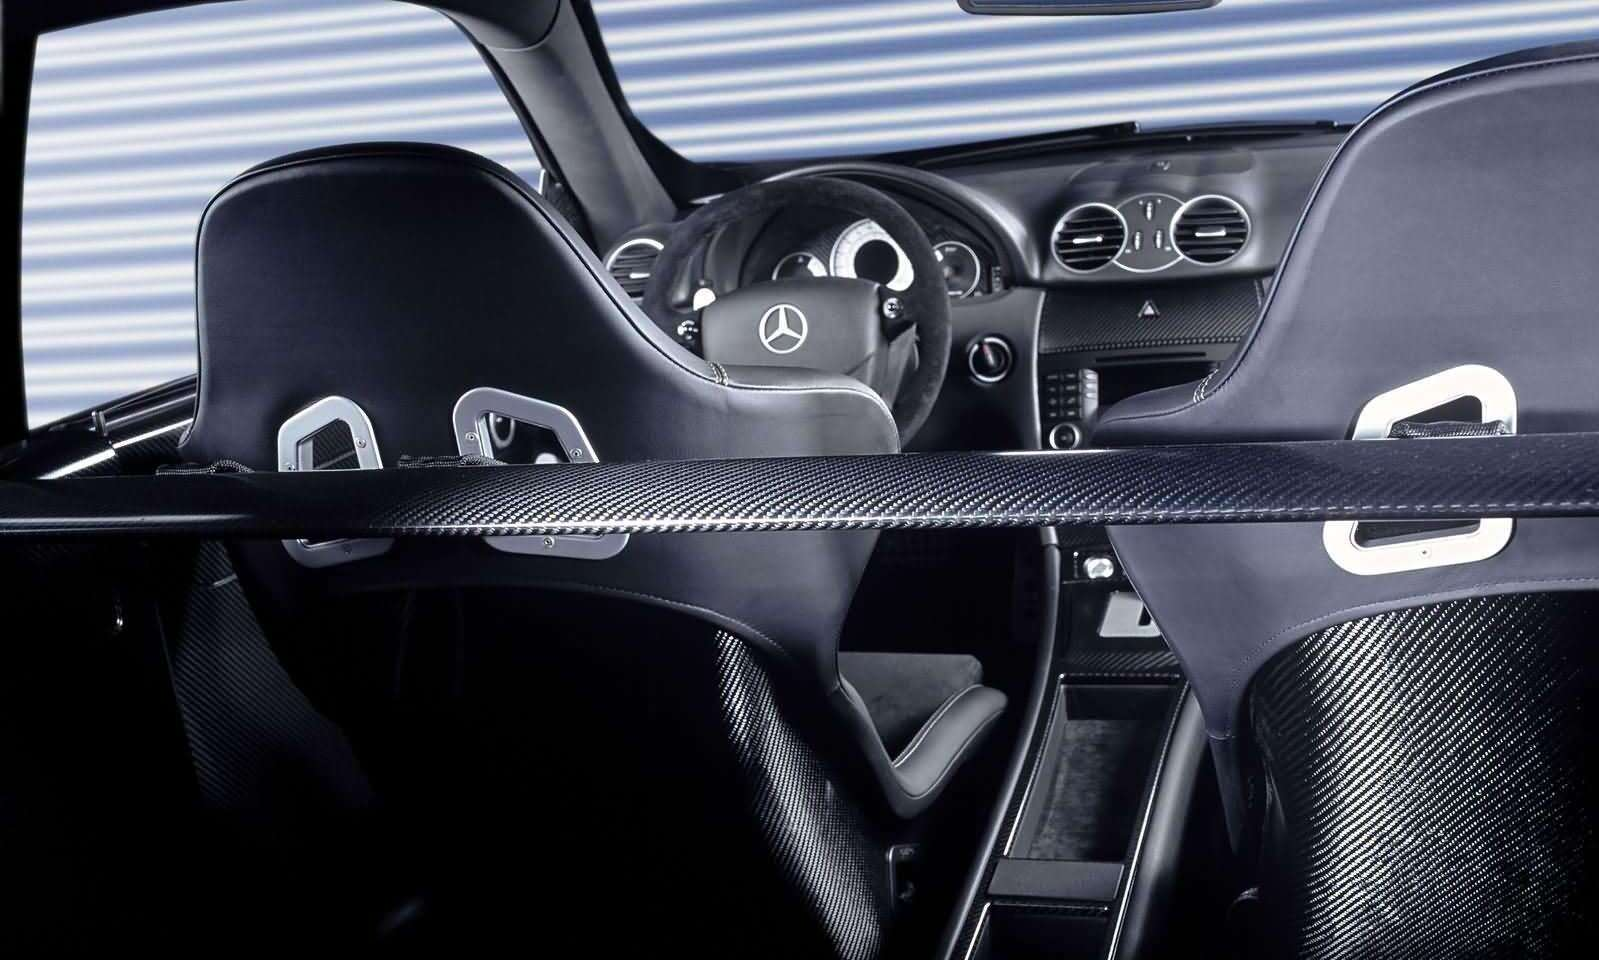 Mercedes Benz Clk Dtm Amg 2004 1600 0b